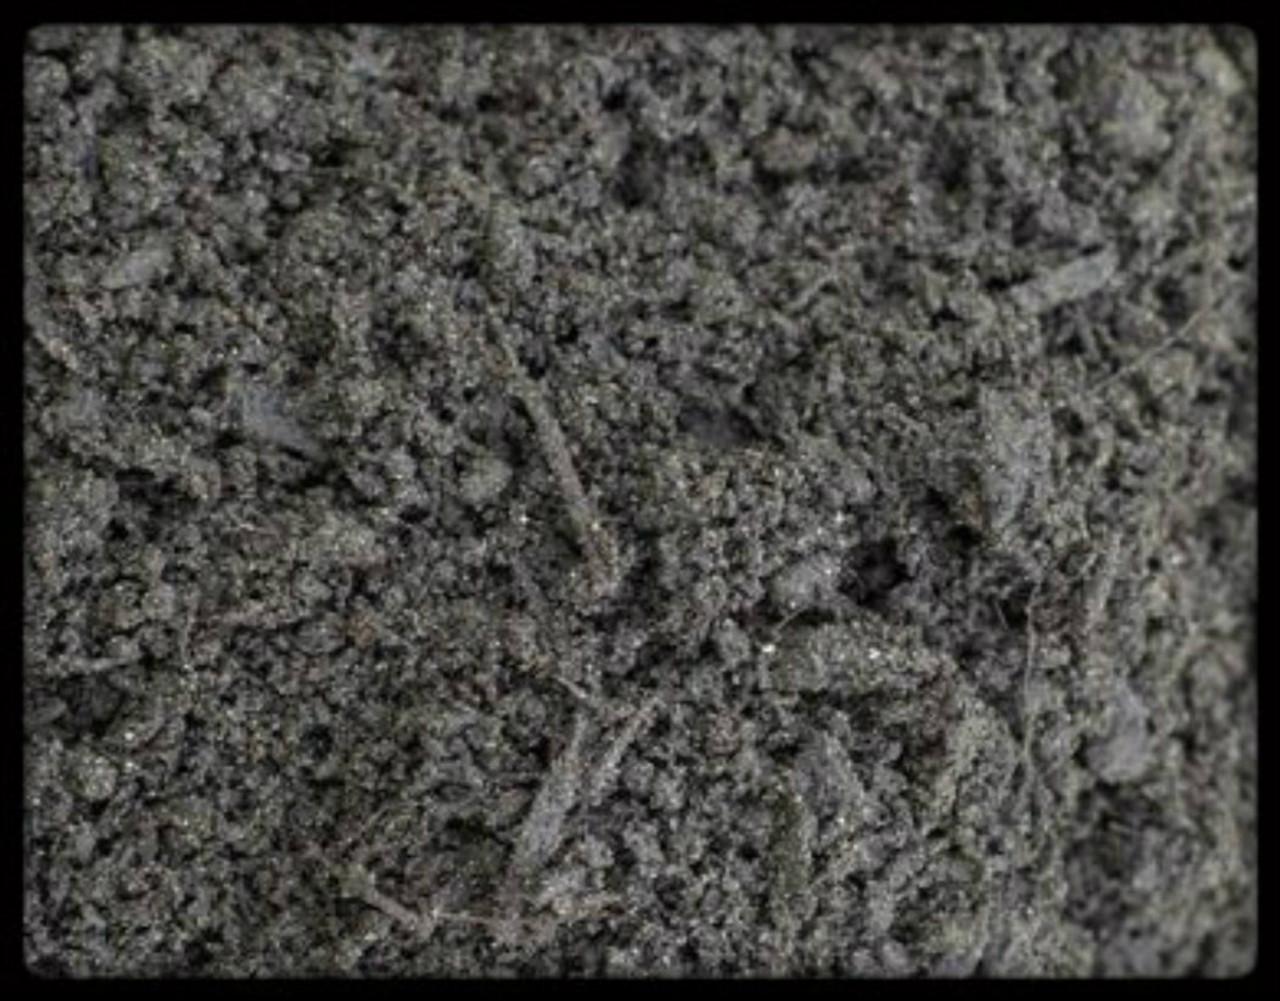 Botanical Blend, organic composted soil - MyGardenBag